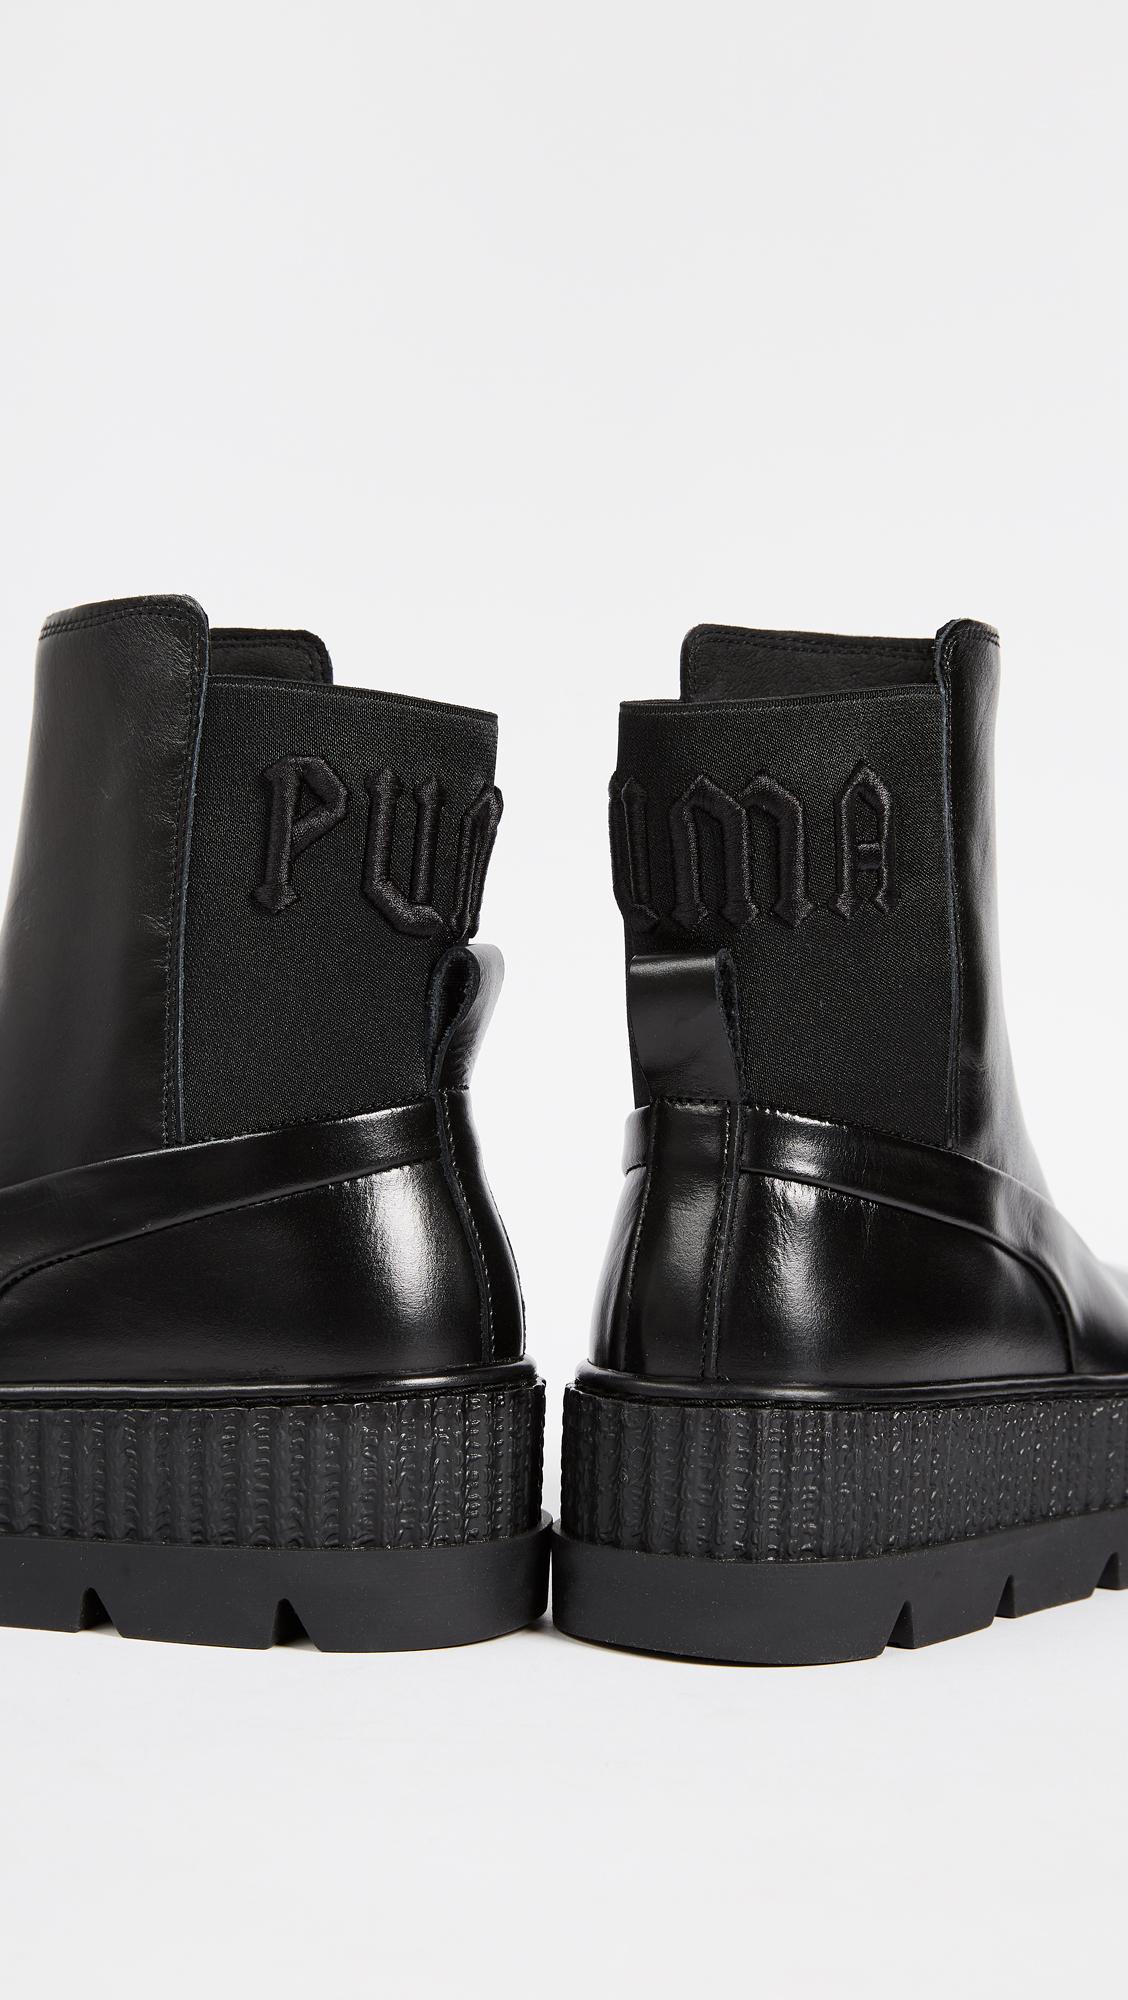 online retailer 40323 83b97 PUMA FENTY x PUMA Chelsea Sneaker Boots   SHOPBOP